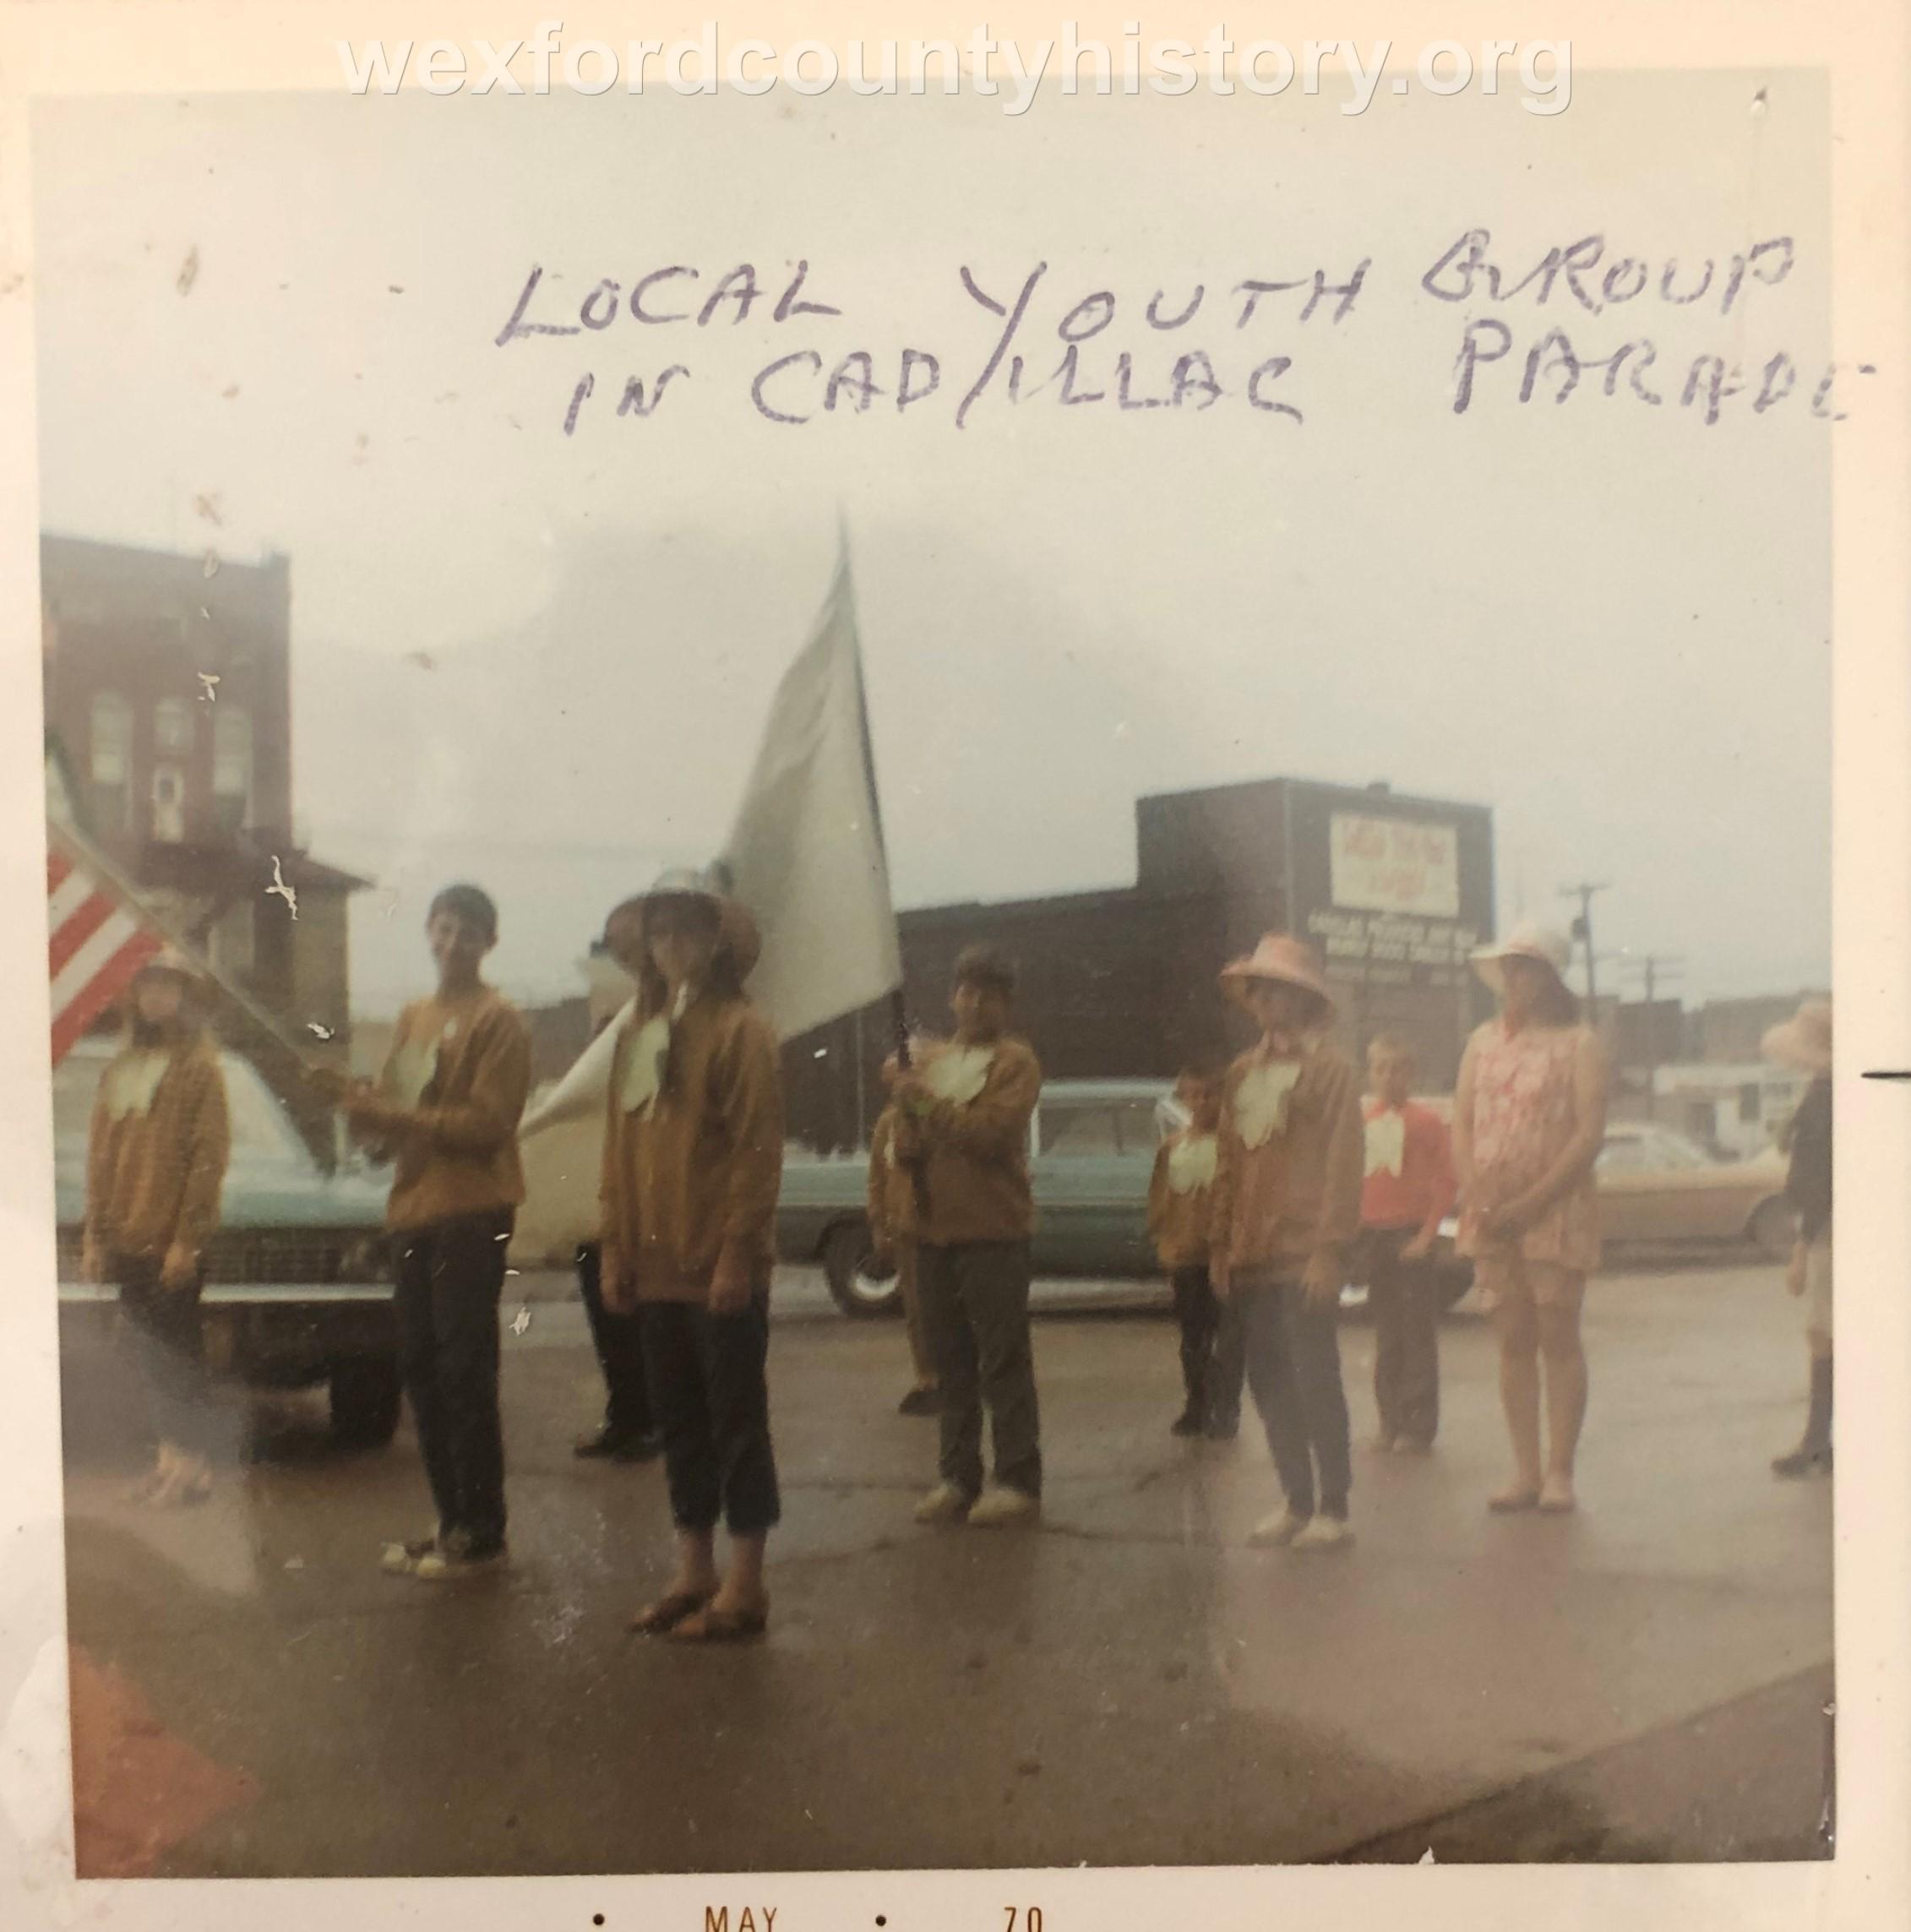 Cadillac-Parade-Local-Youth-Group-In-Parade-1